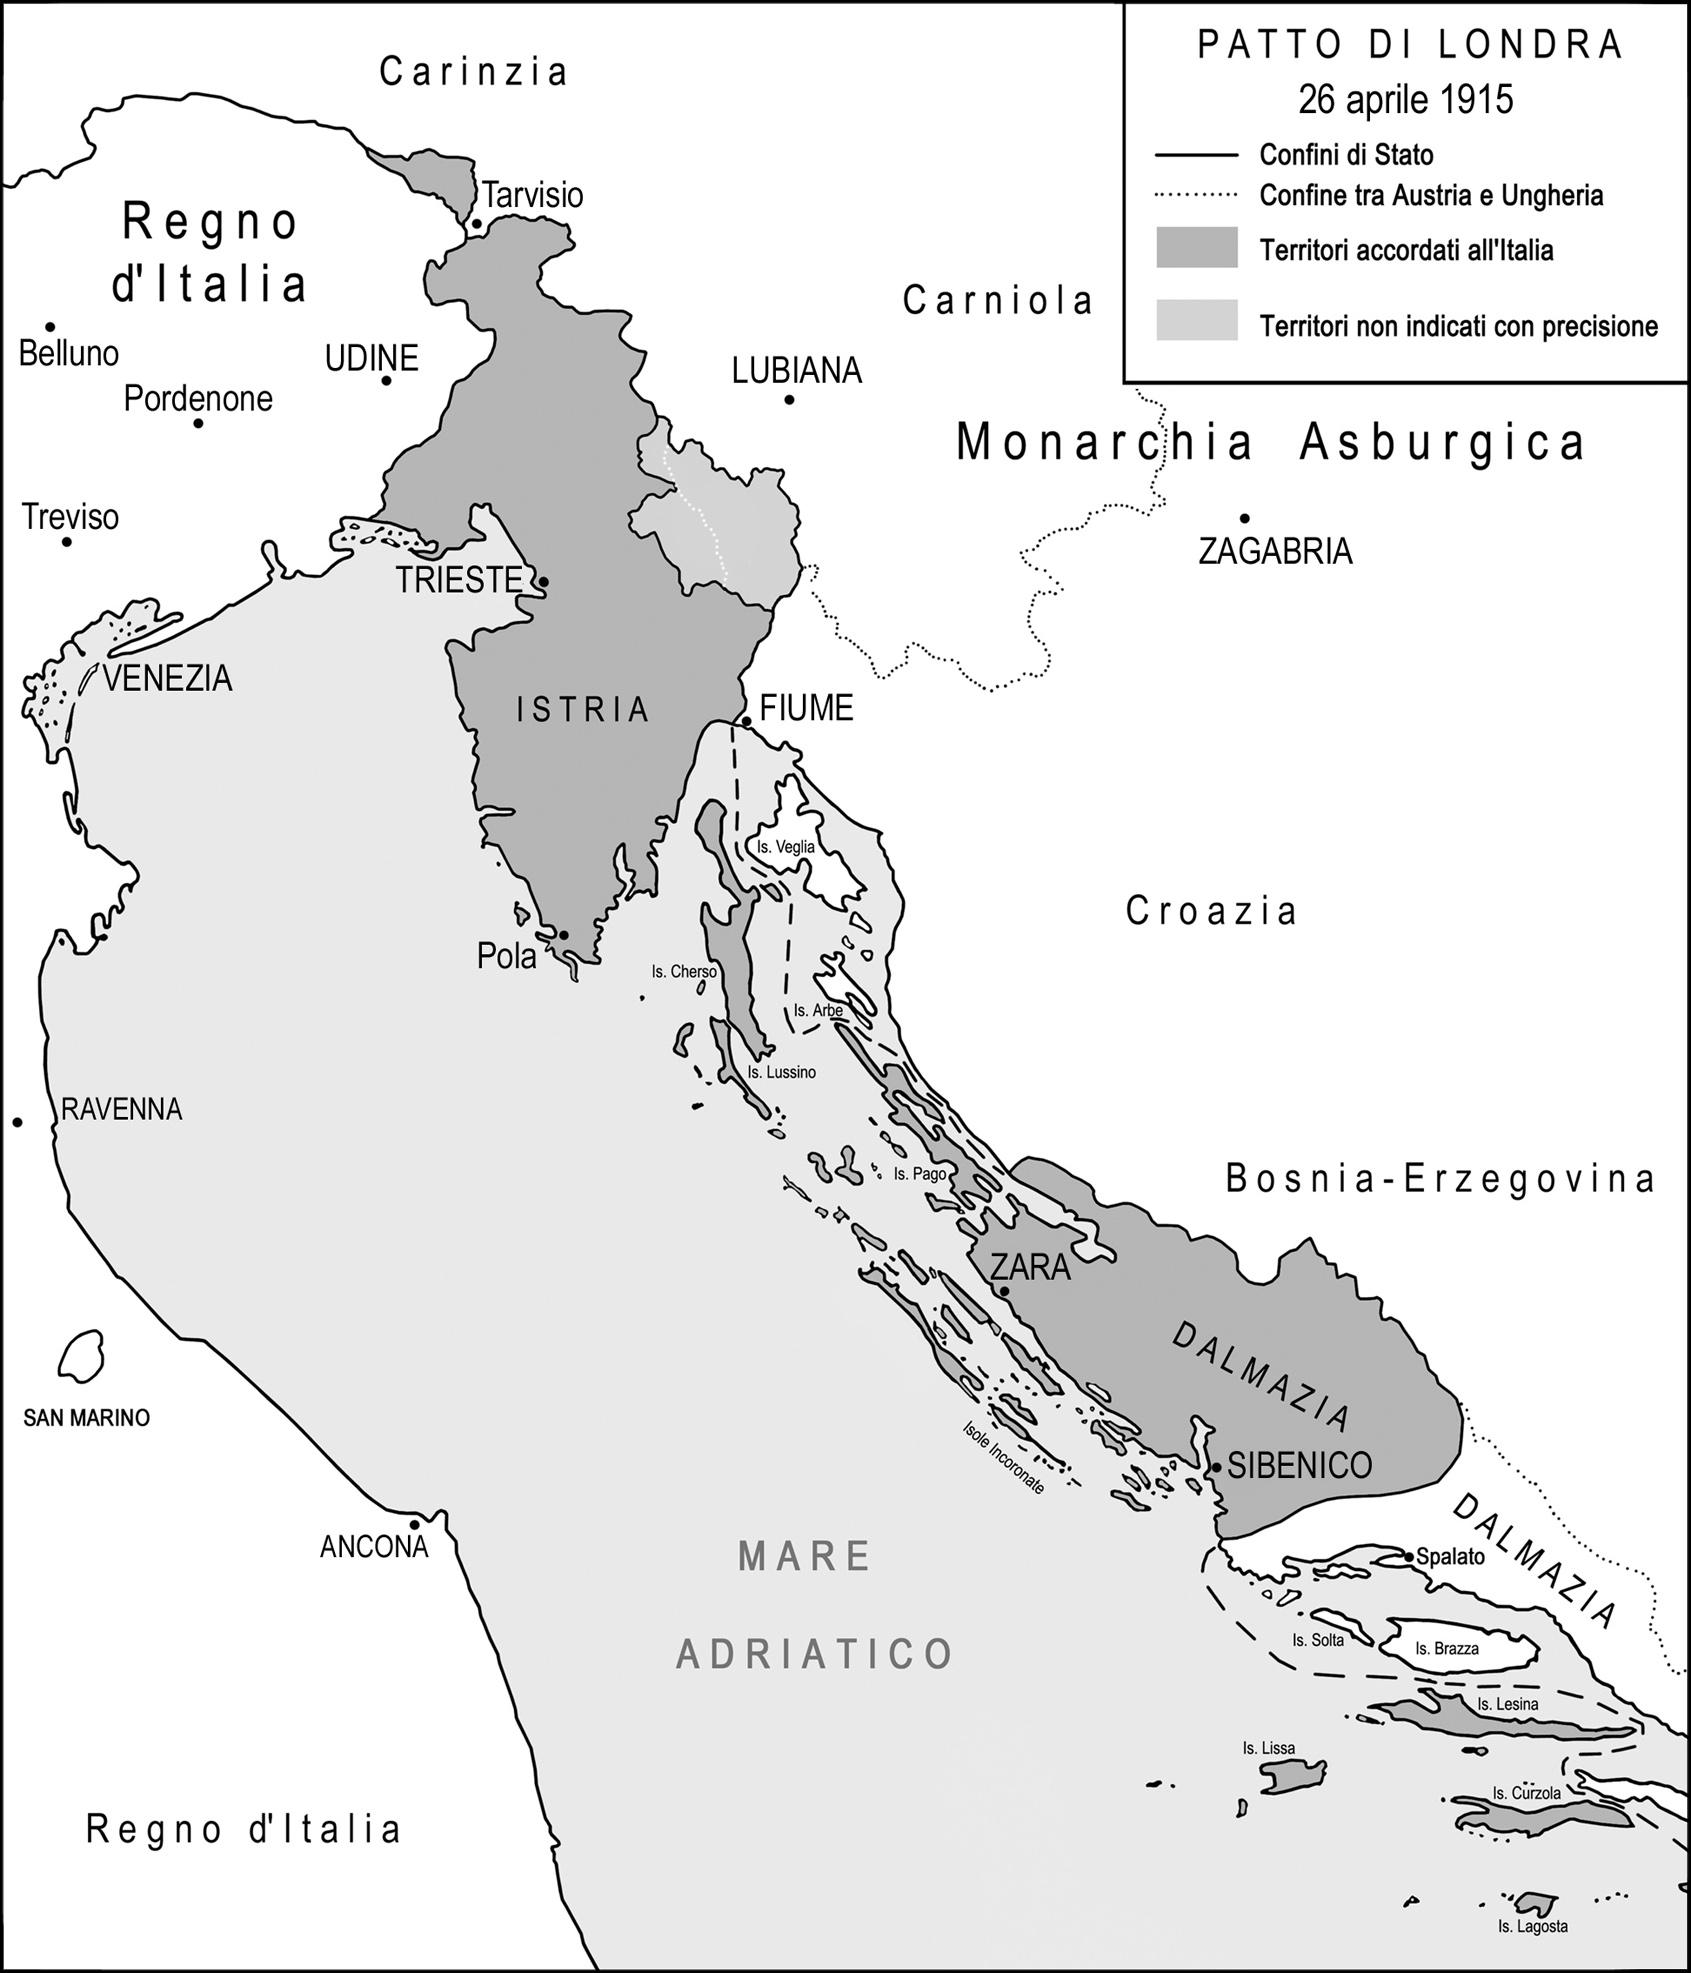 Cartina D Italia 1915.Terre Irredente Atlante Della Grande Guerra A Nord Est